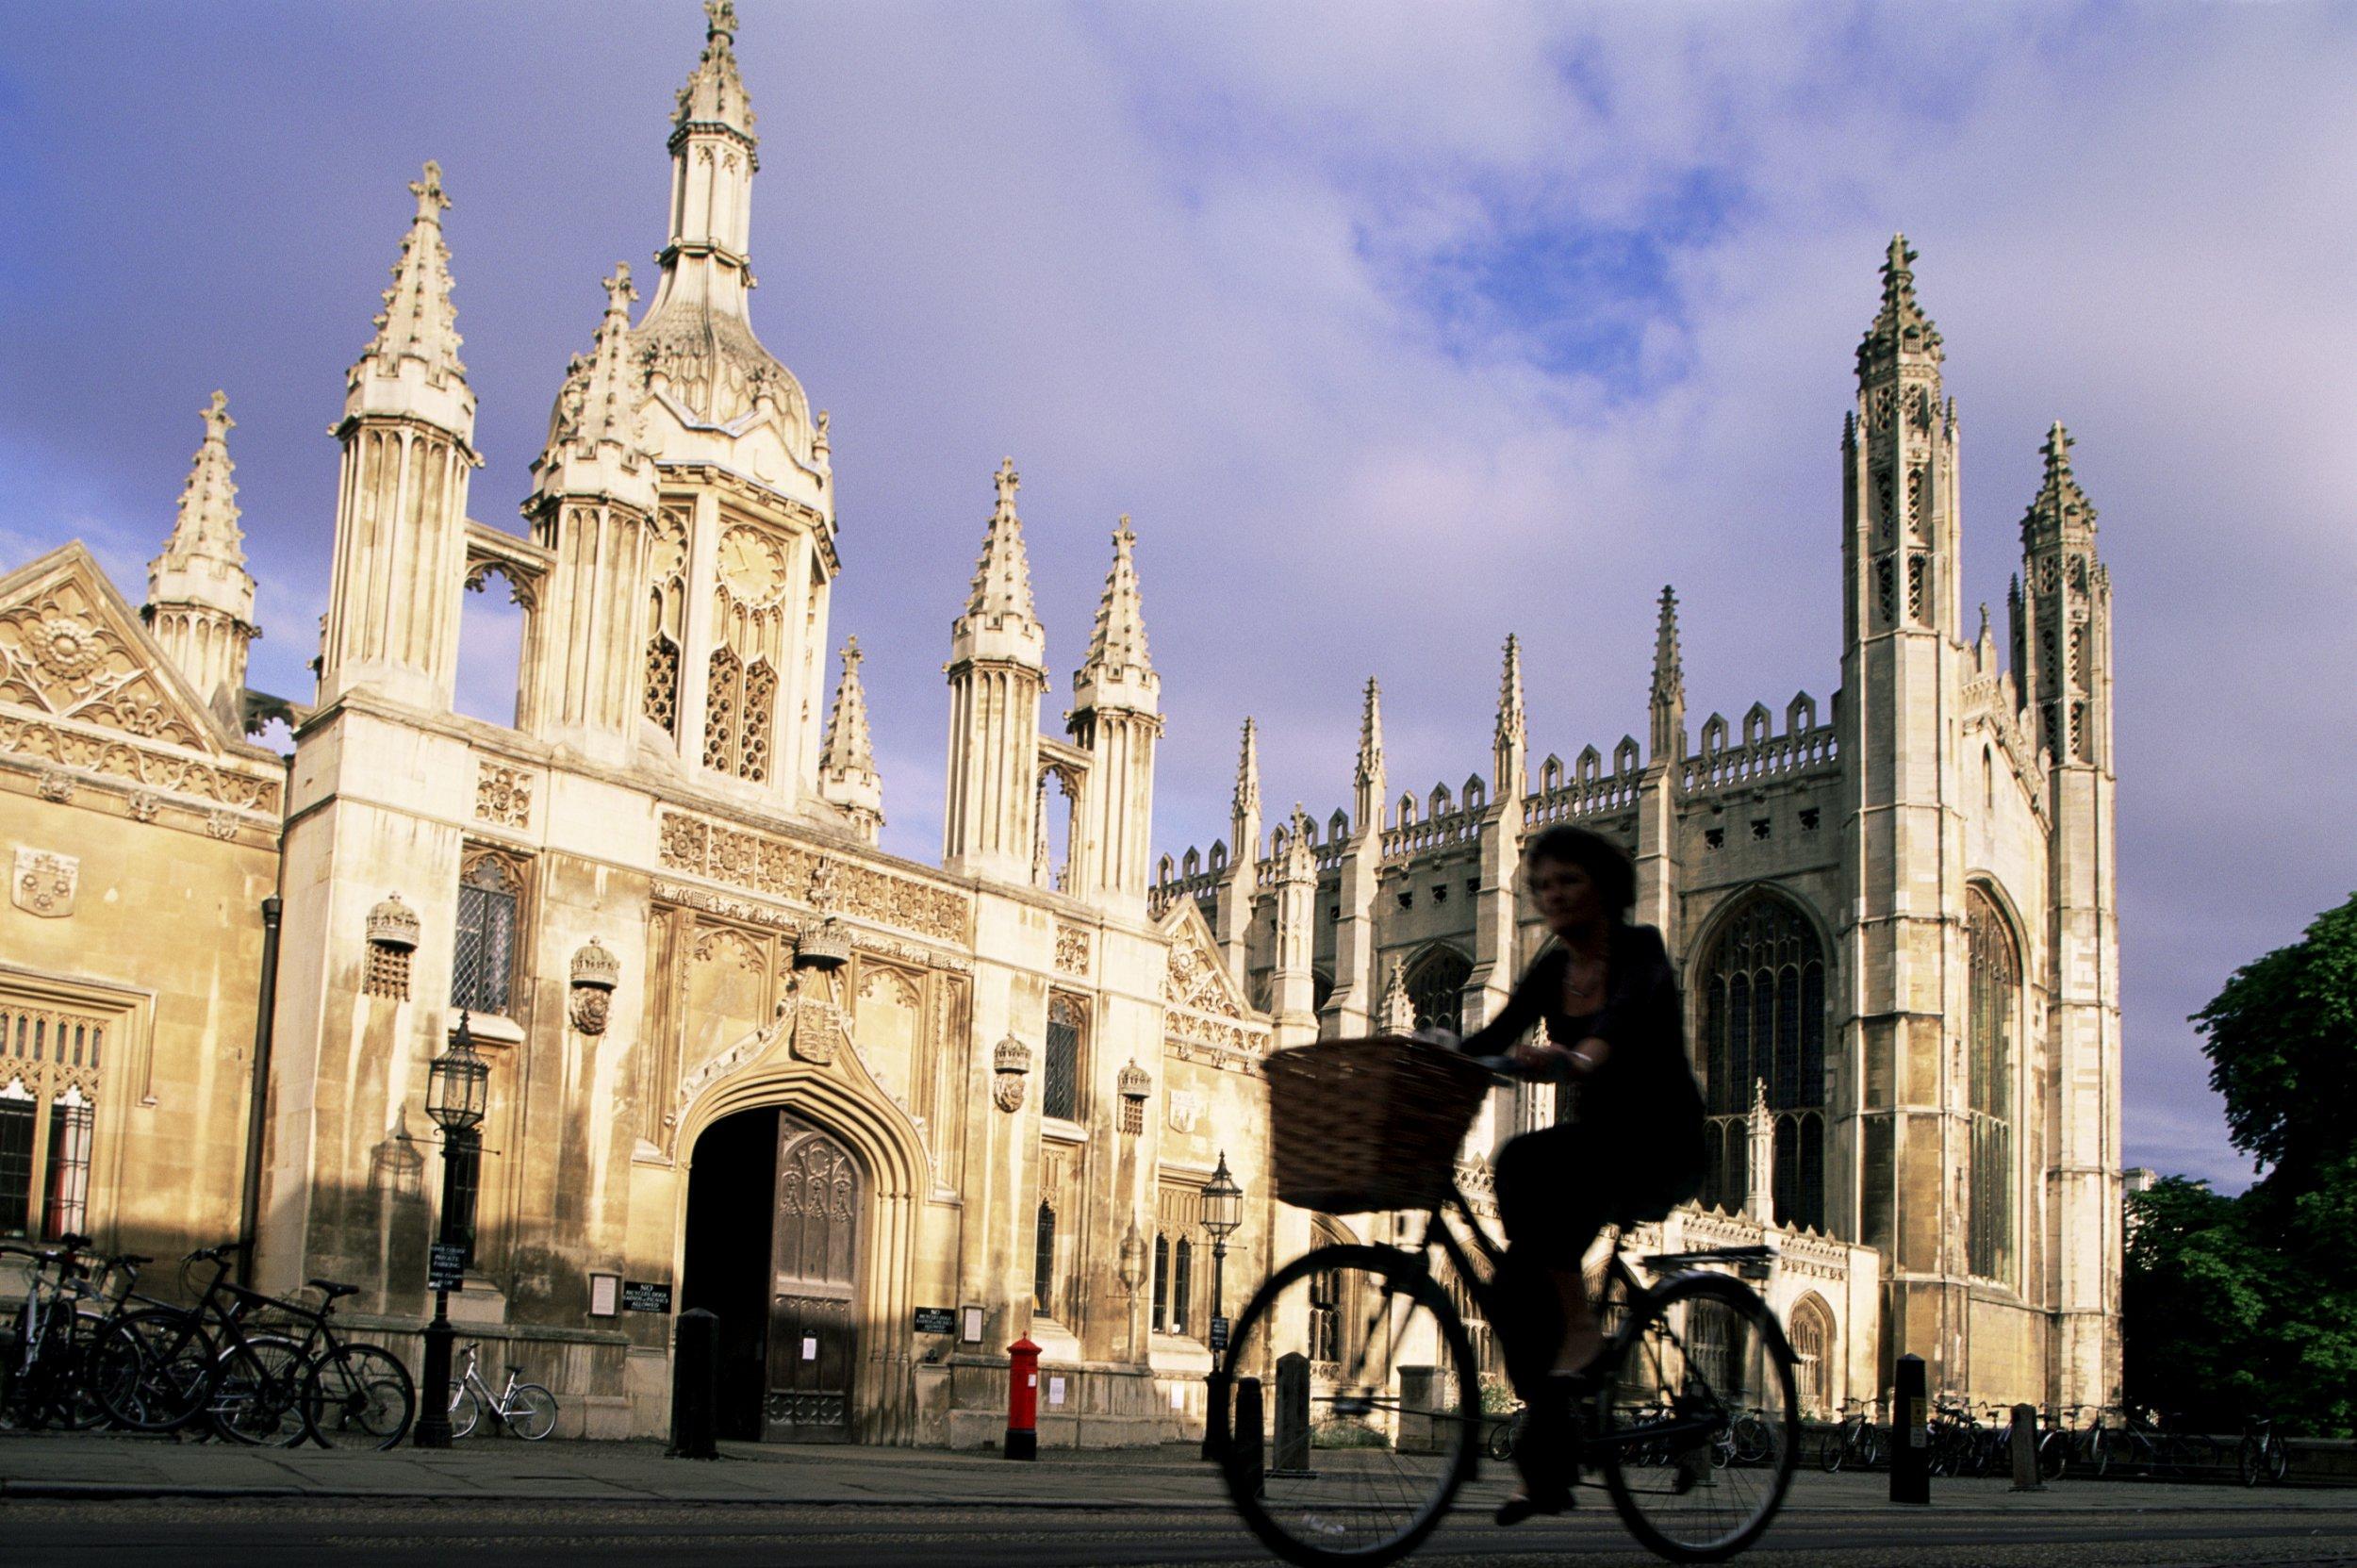 King's College, Cambridge, Cambridgeshire, England, United Kingdom, Europe